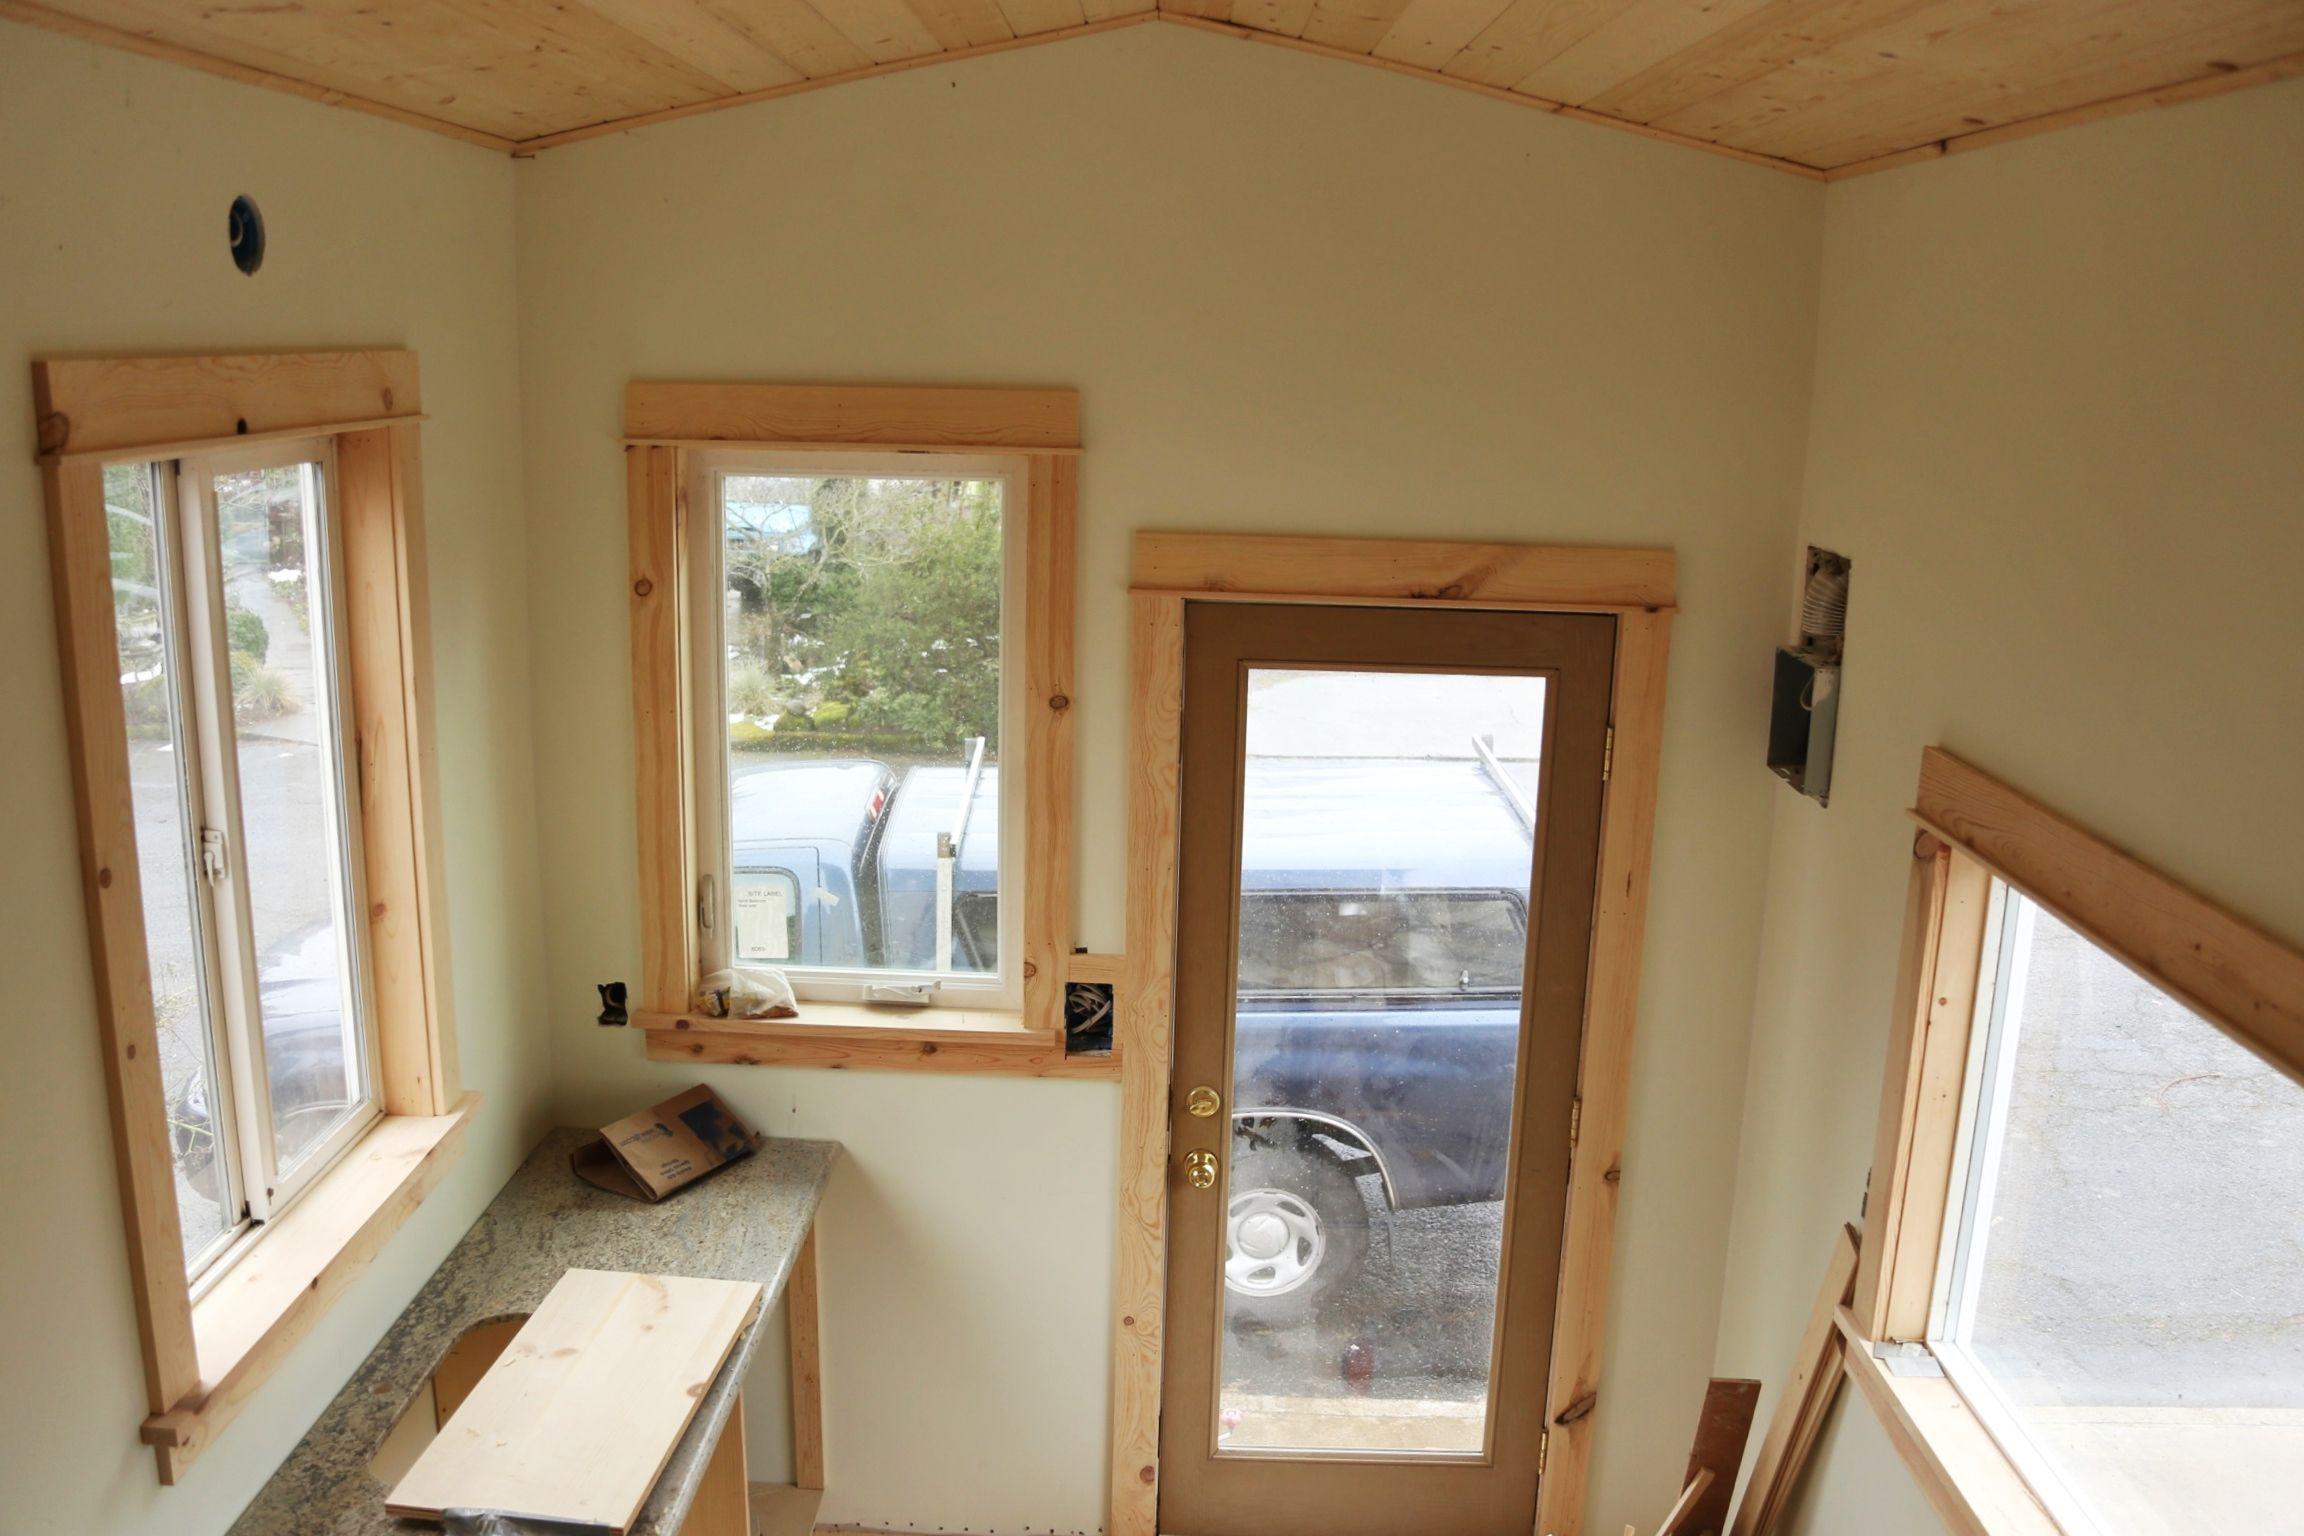 Simple interior window trim - Birch Wood Trim House Google Search